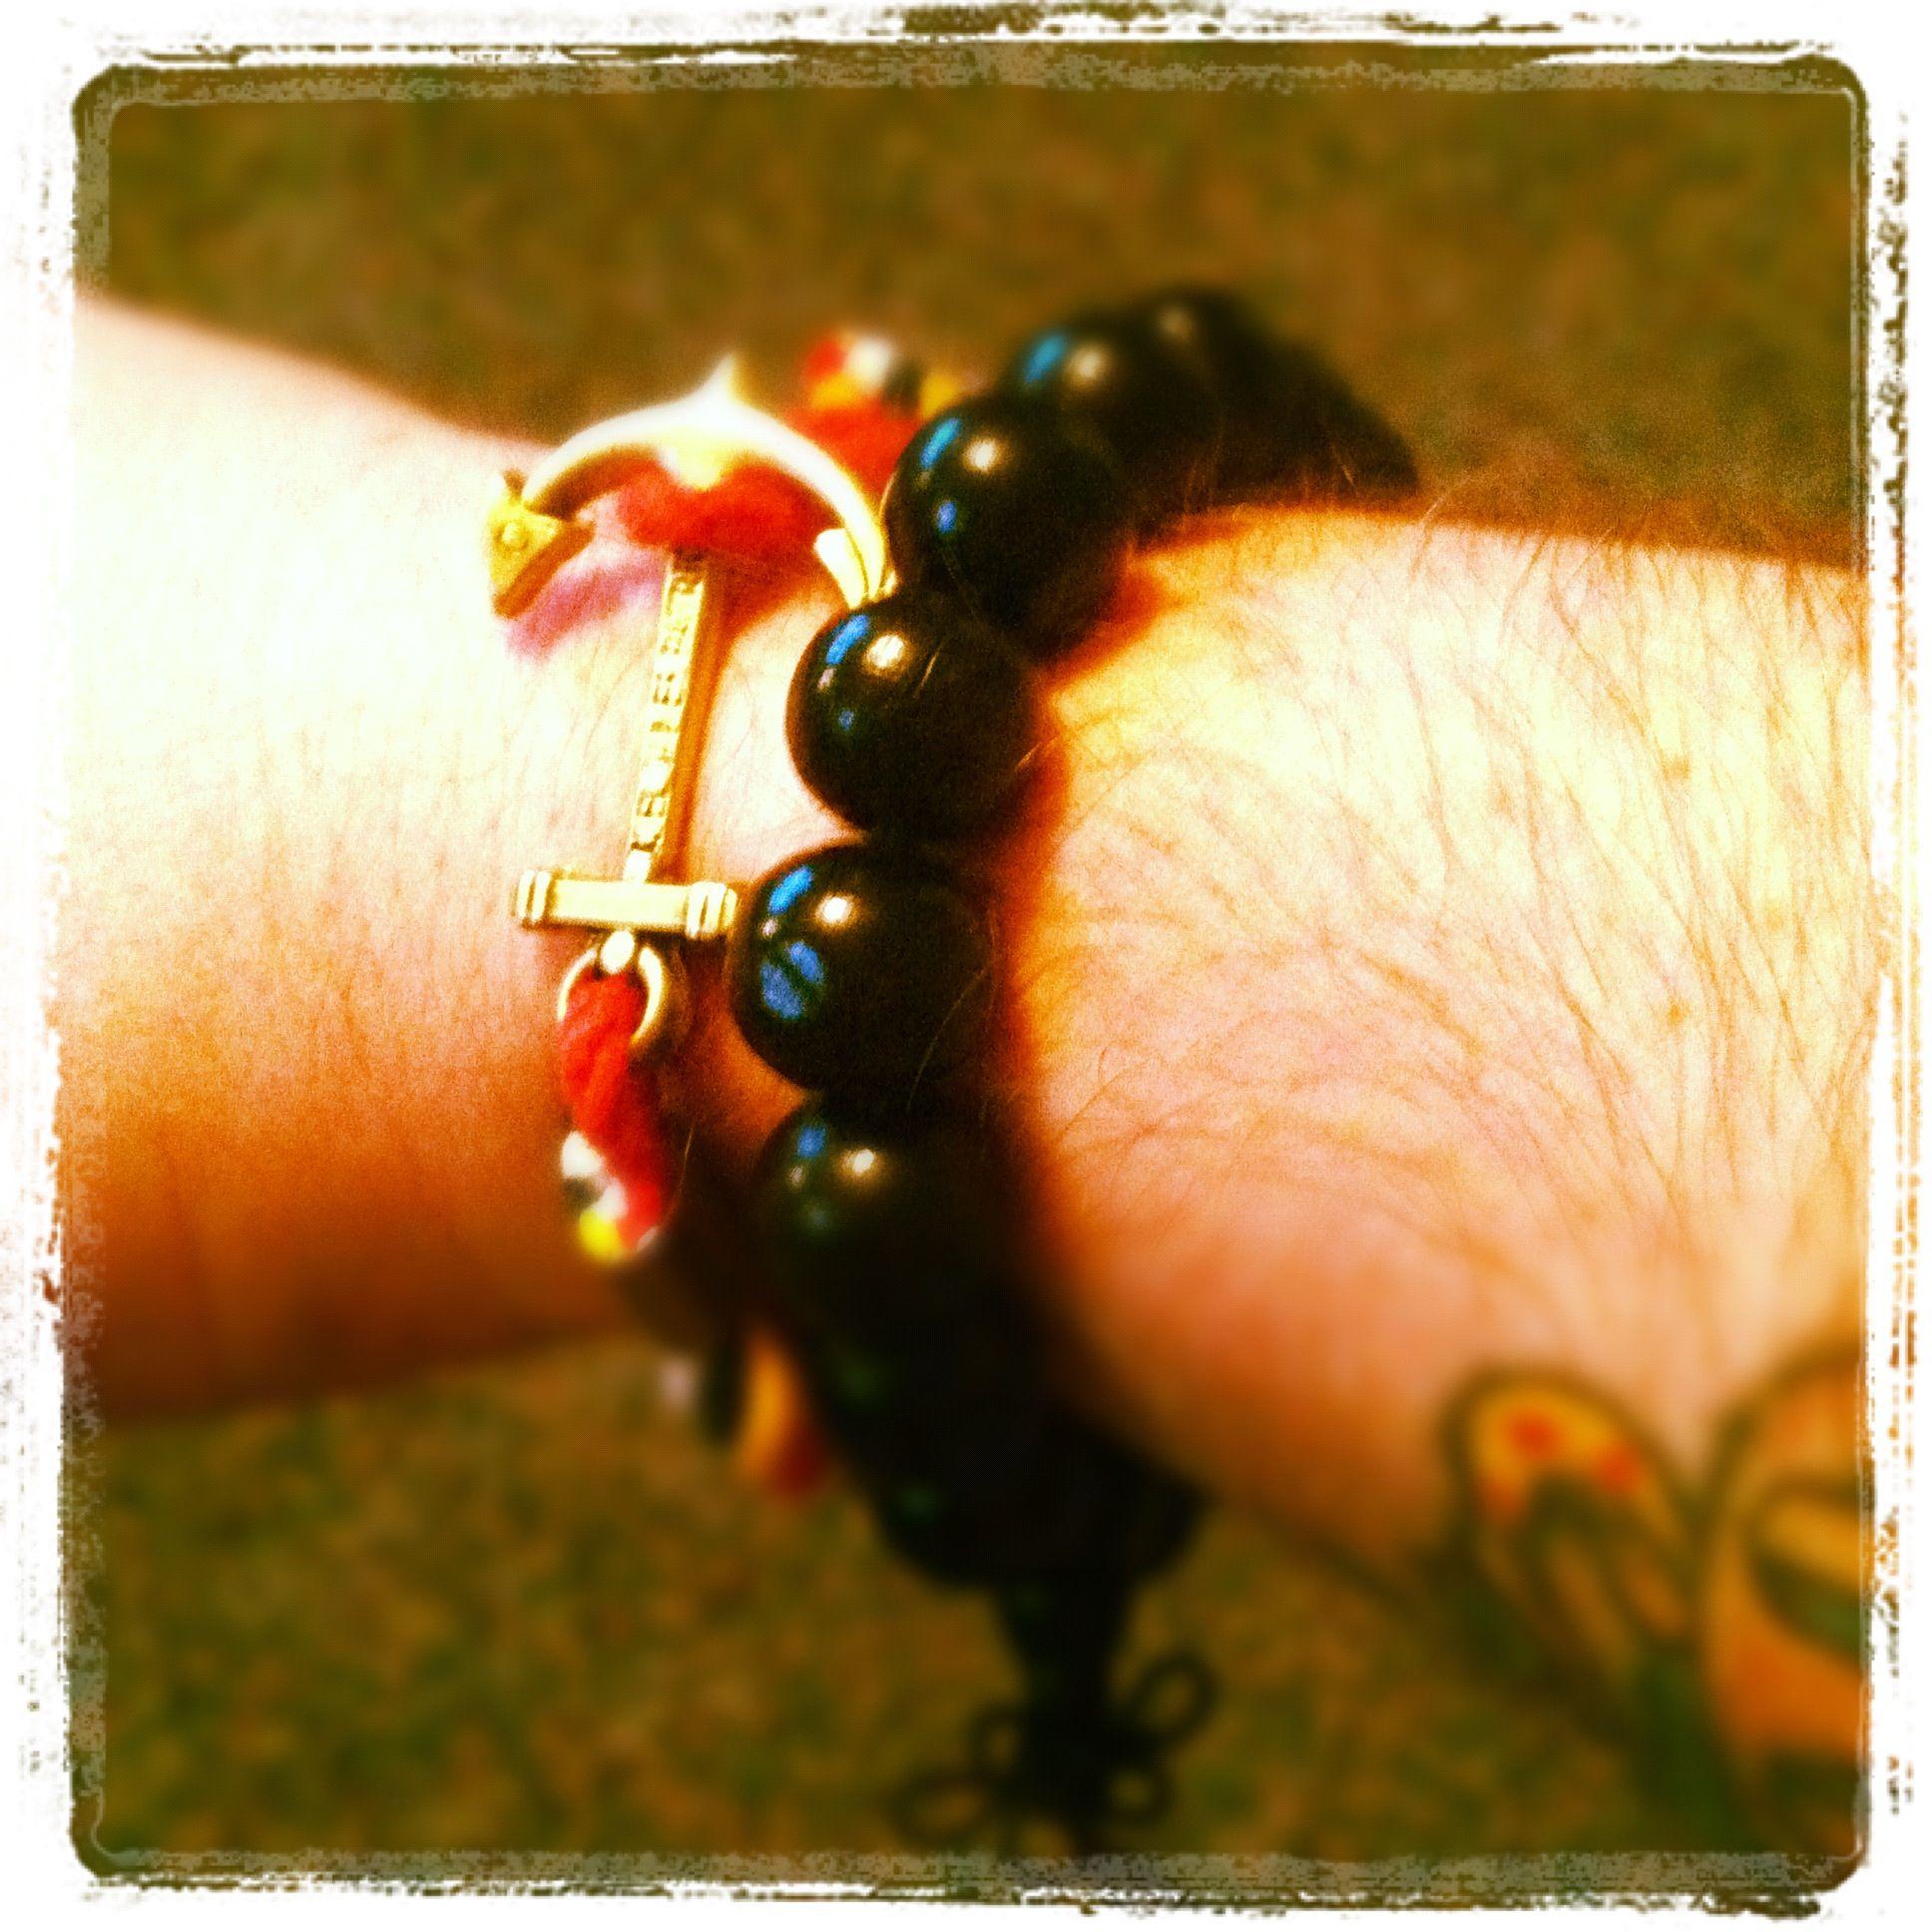 My new Kiel James Patrick anchor bracelet